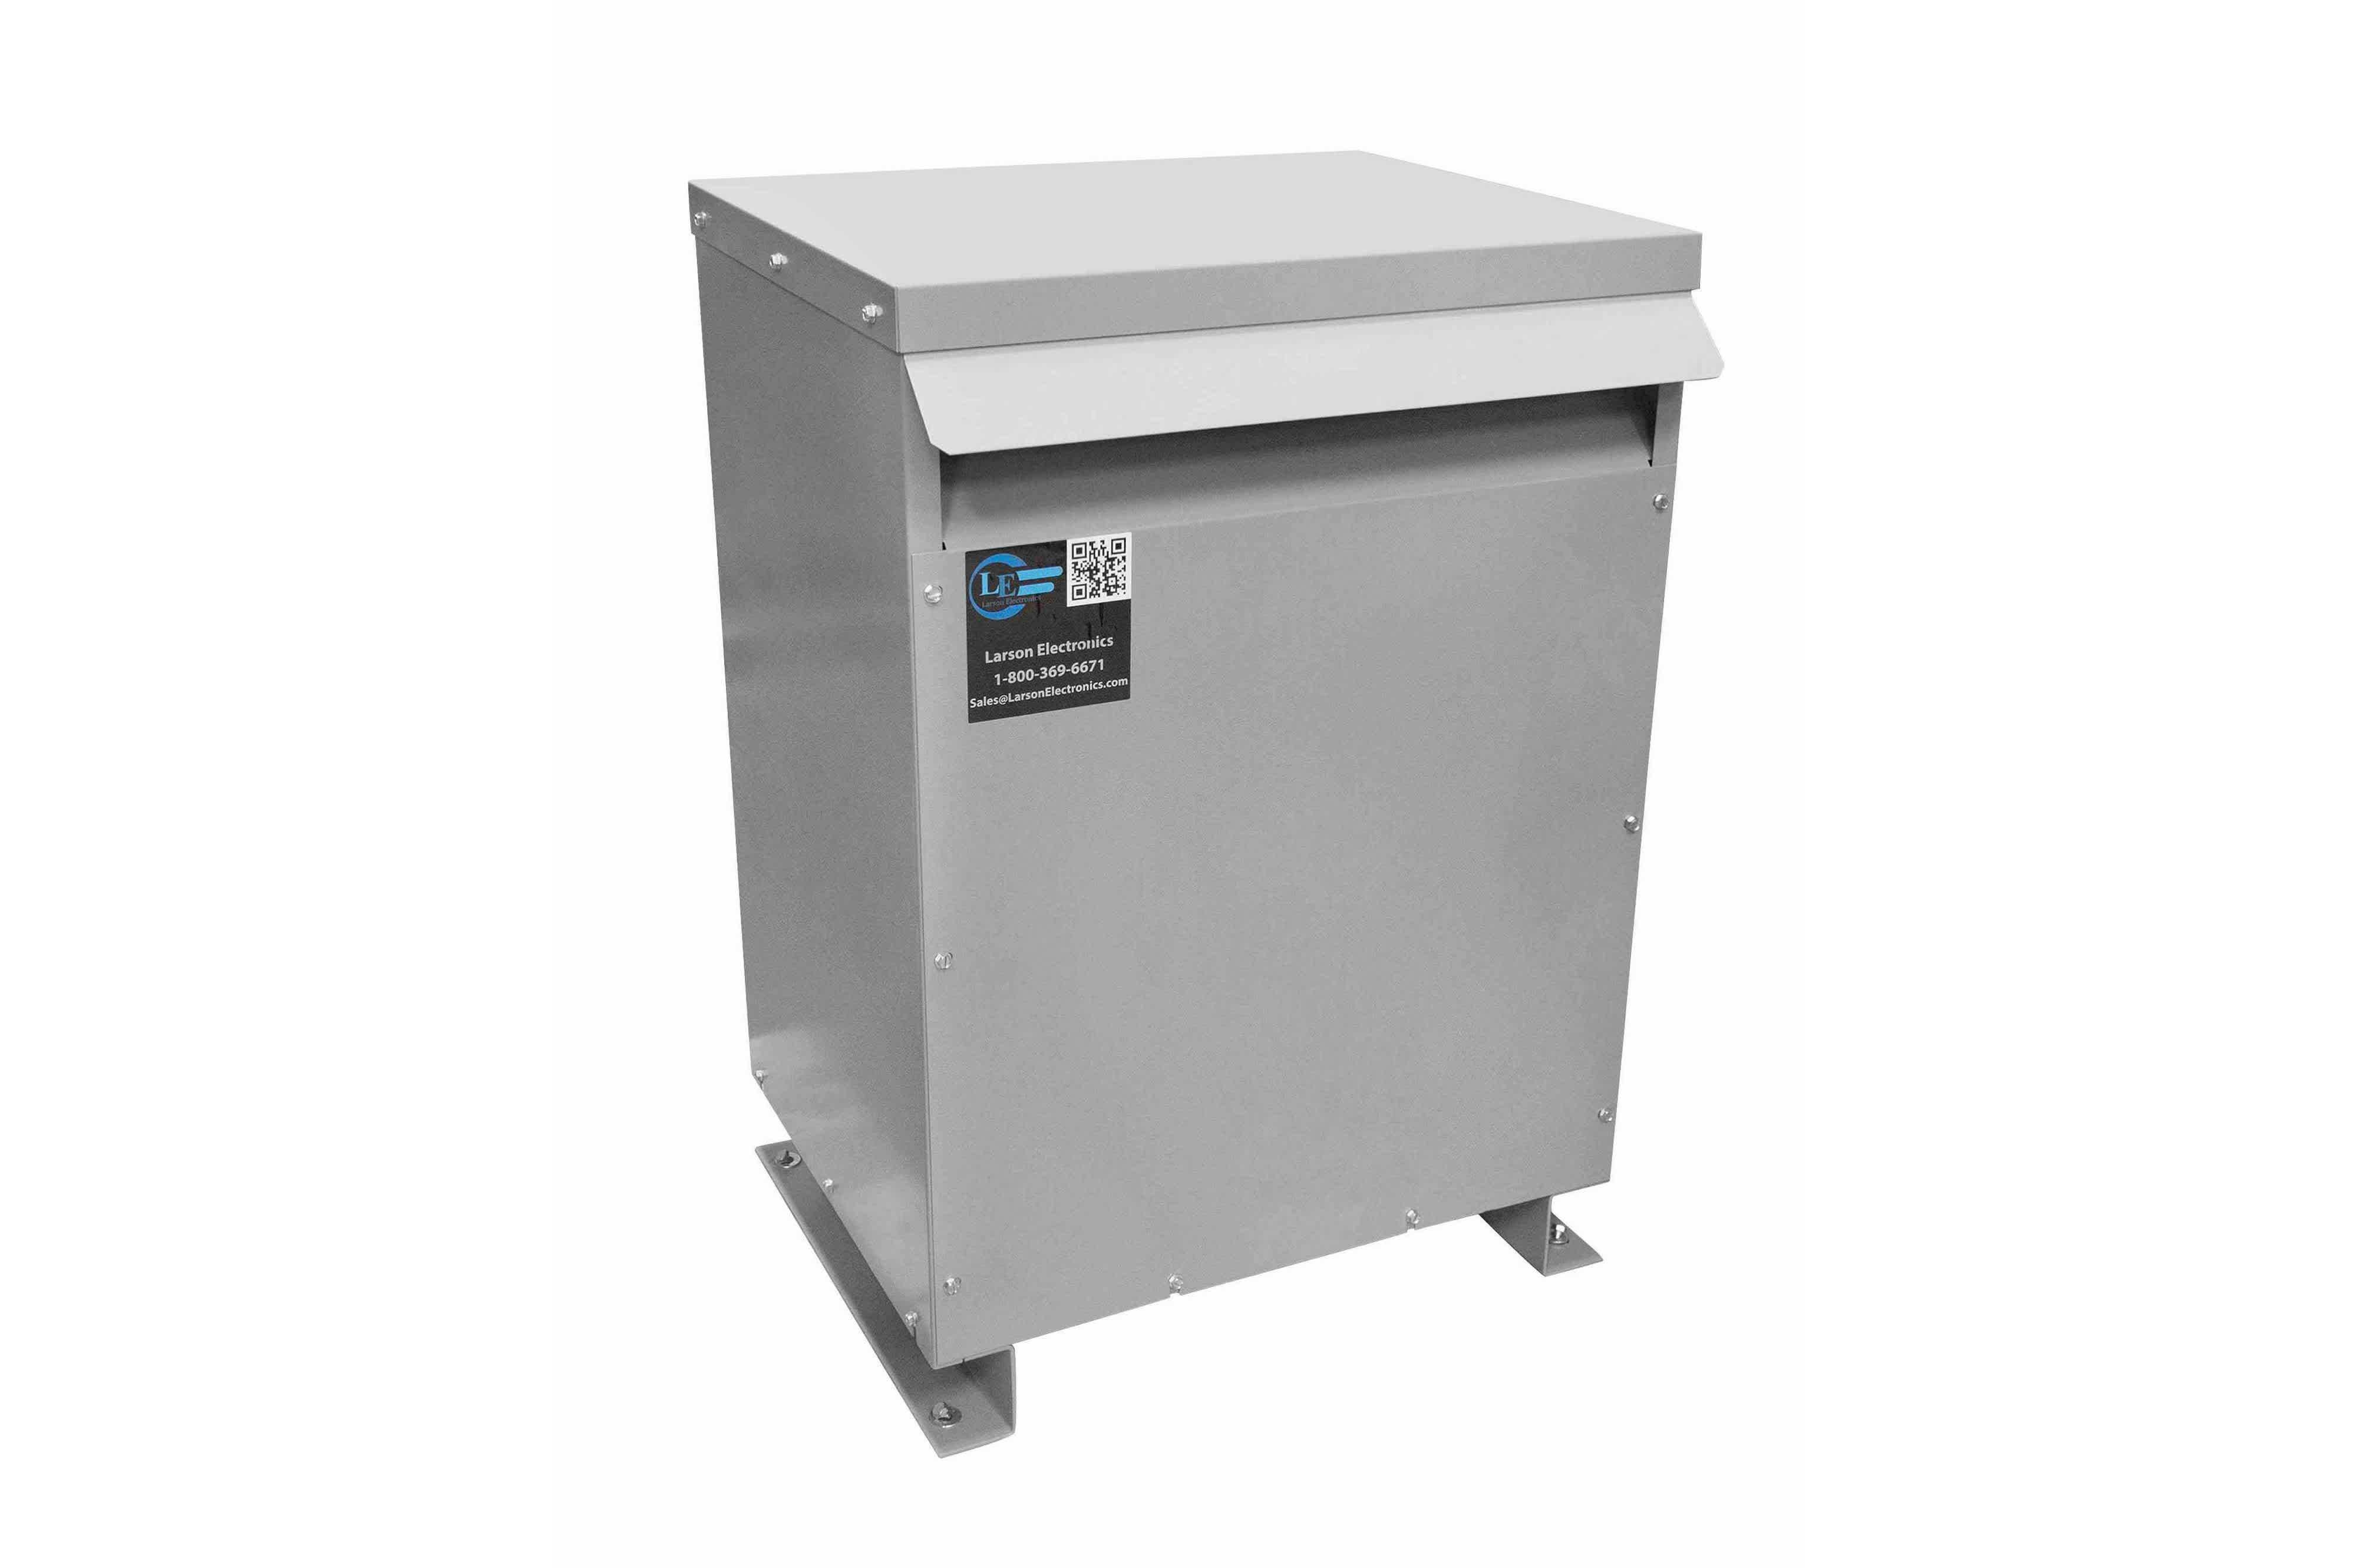 250 kVA 3PH Isolation Transformer, 440V Wye Primary, 208Y/120 Wye-N Secondary, N3R, Ventilated, 60 Hz